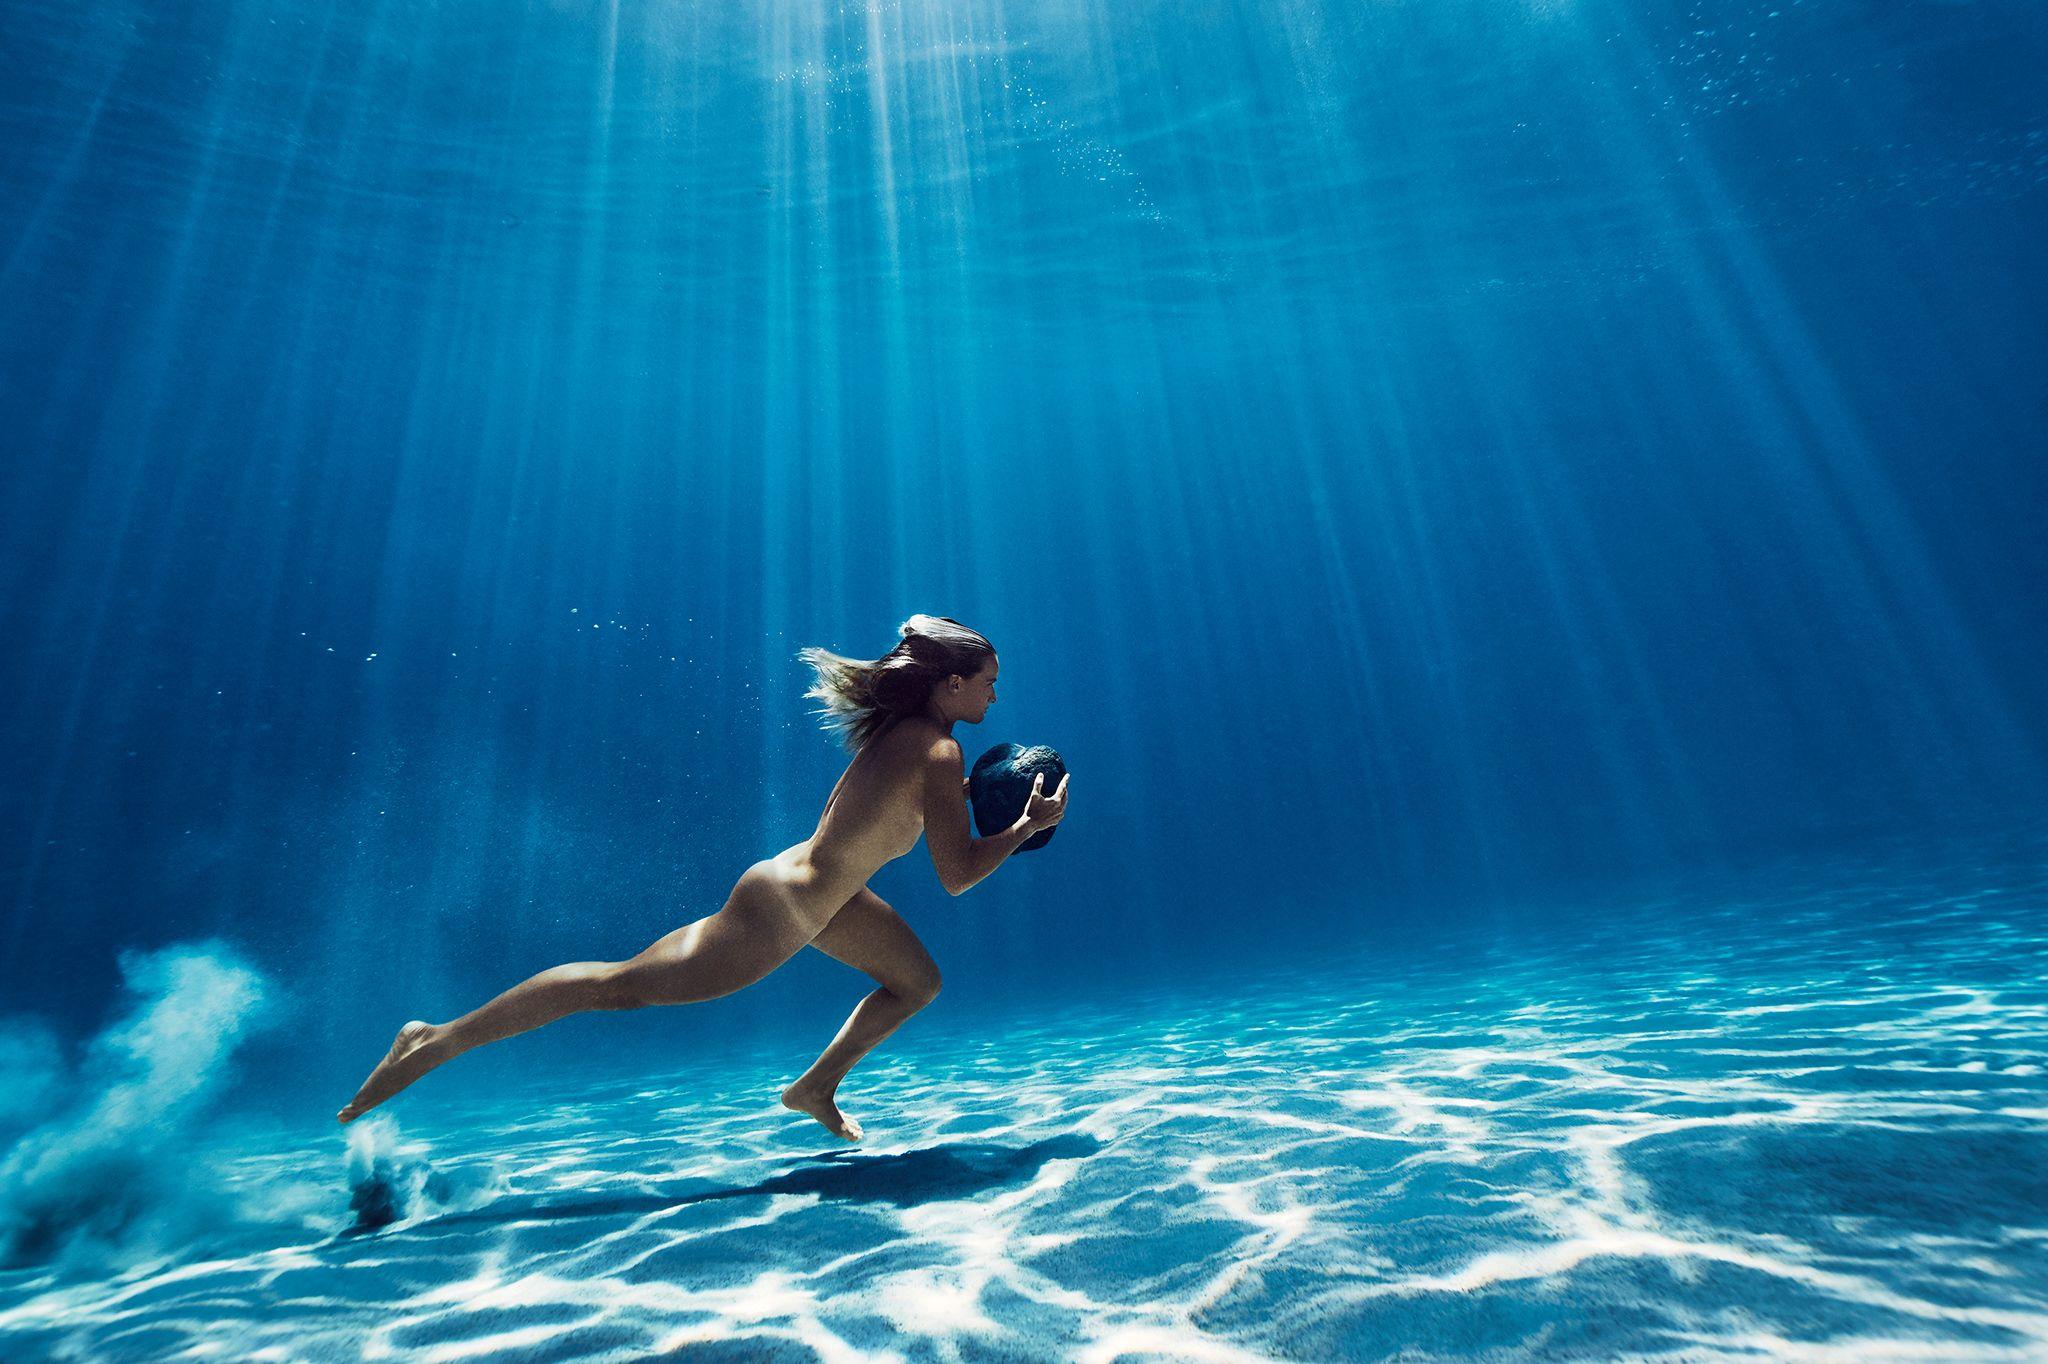 Nudie Surfing, Empowerment Objectification Sea Kin